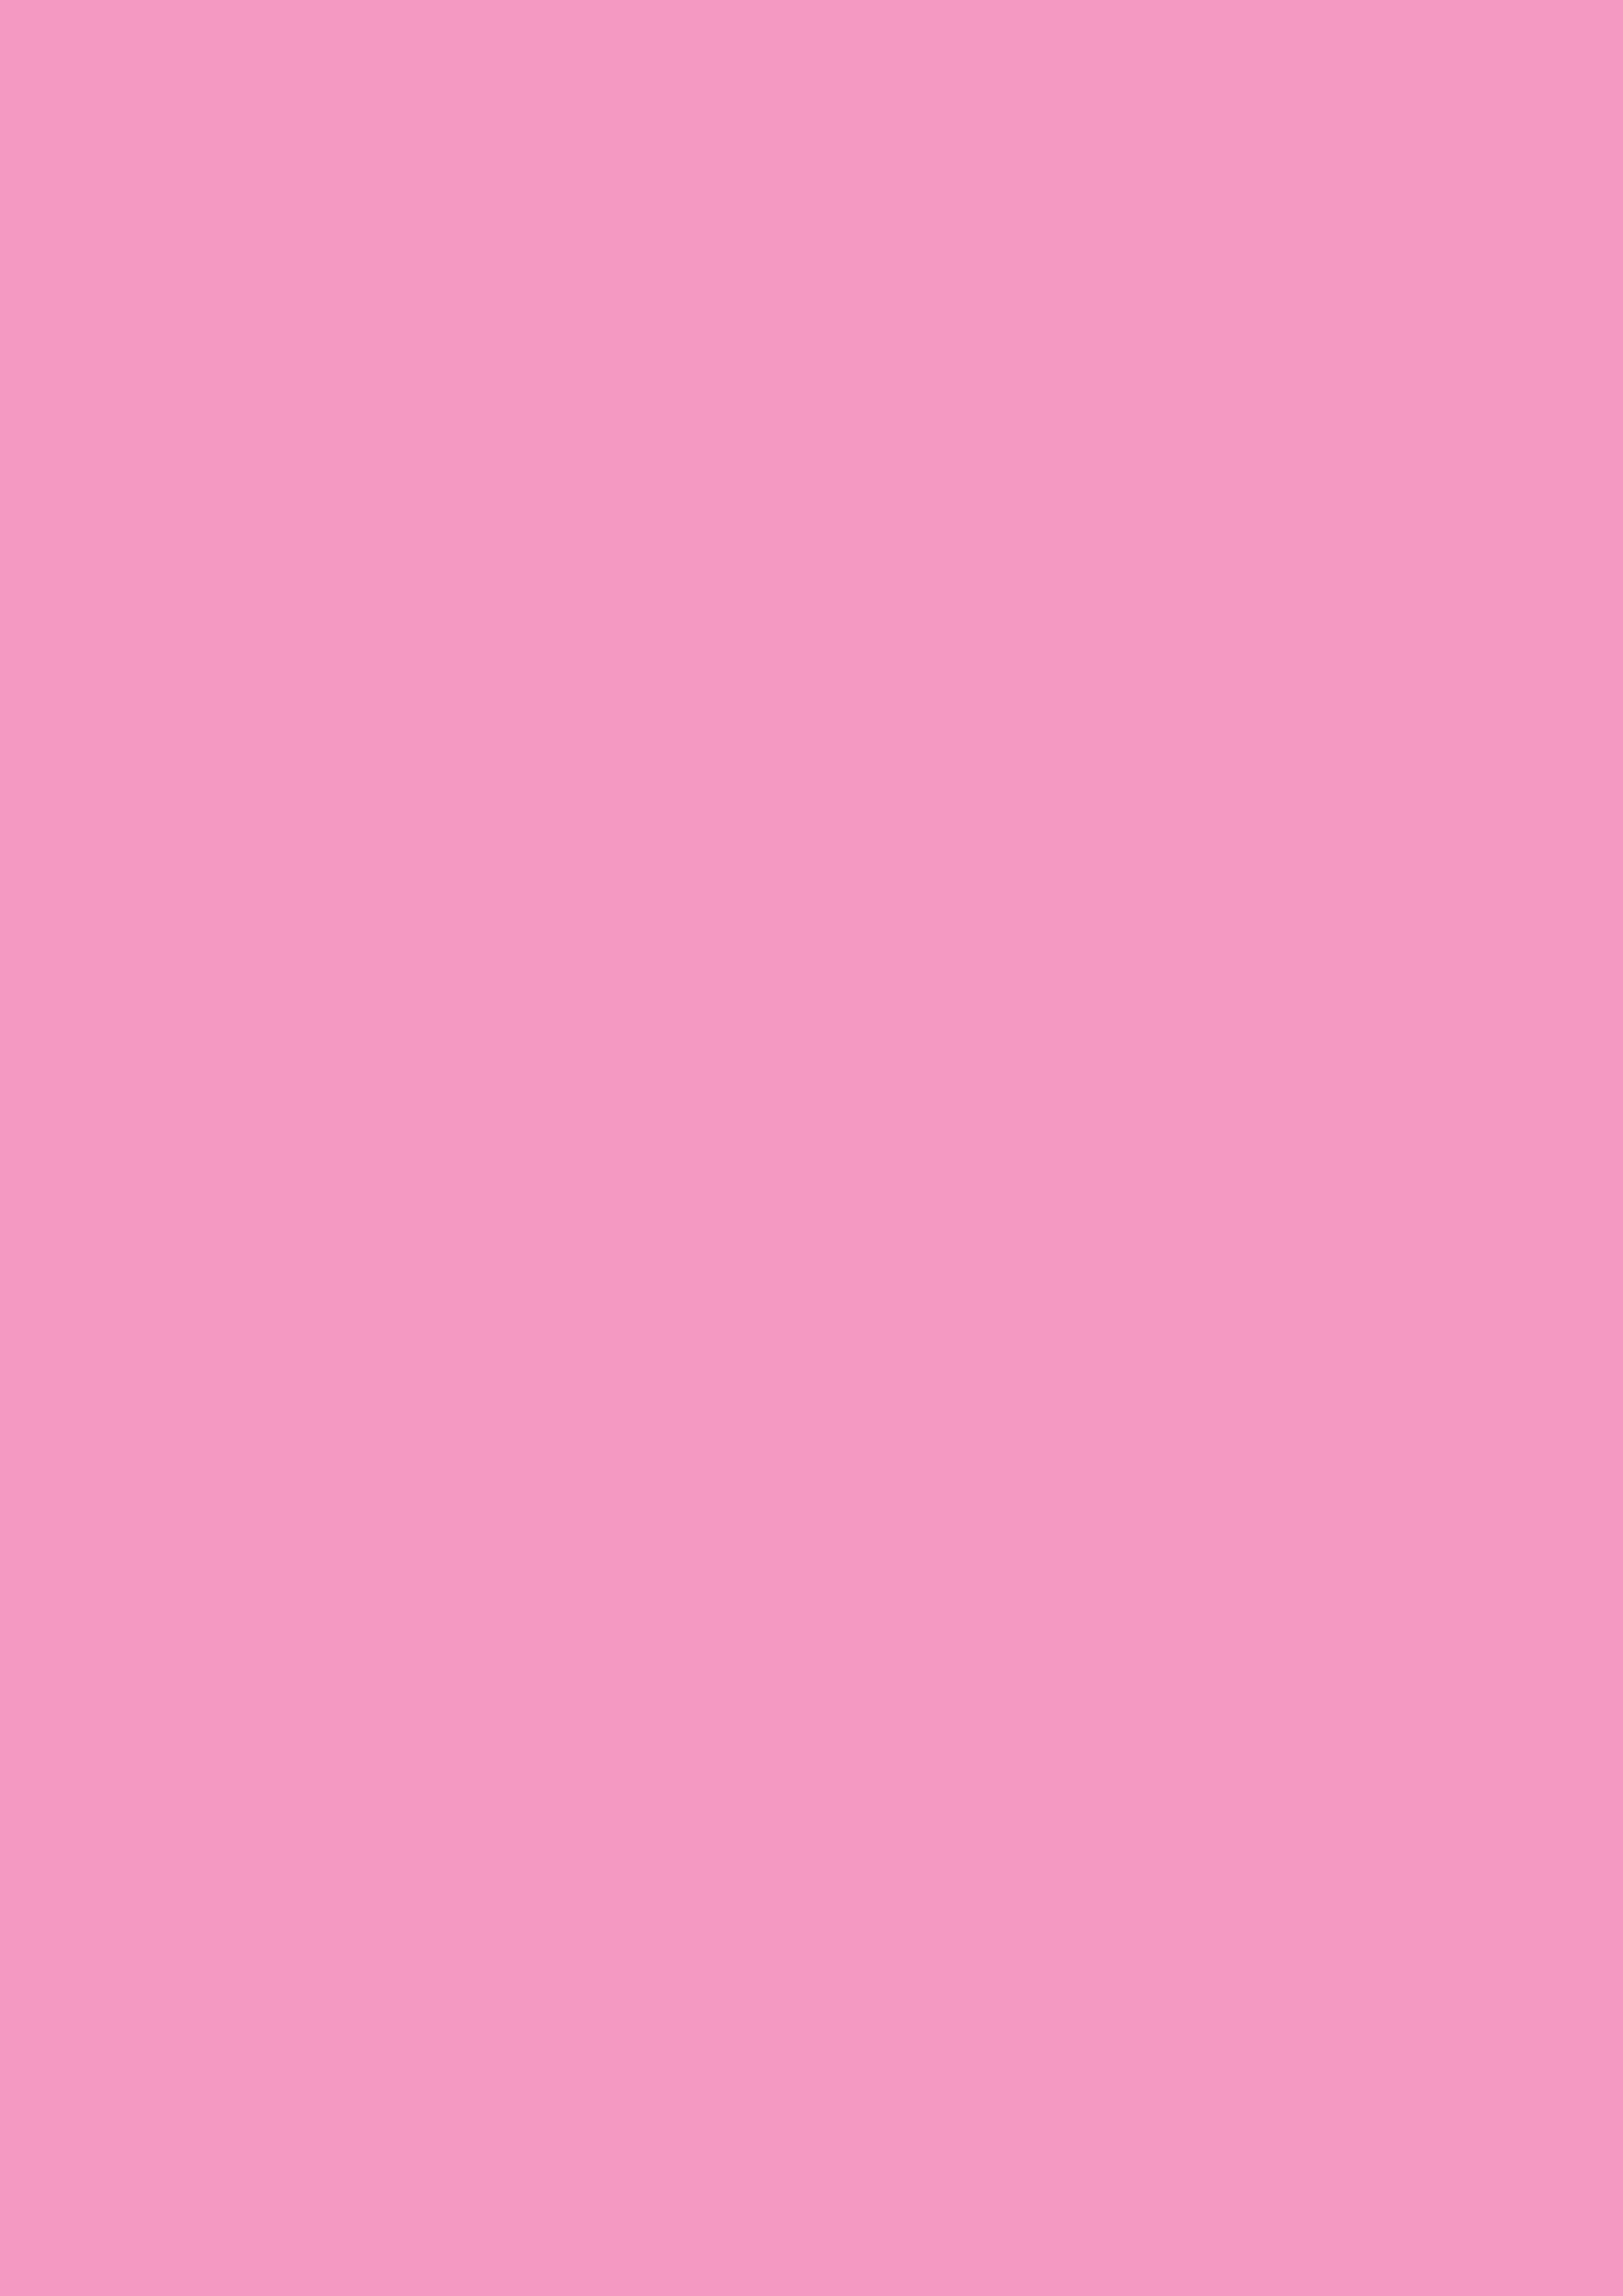 2480x3508 Pastel Magenta Solid Color Background